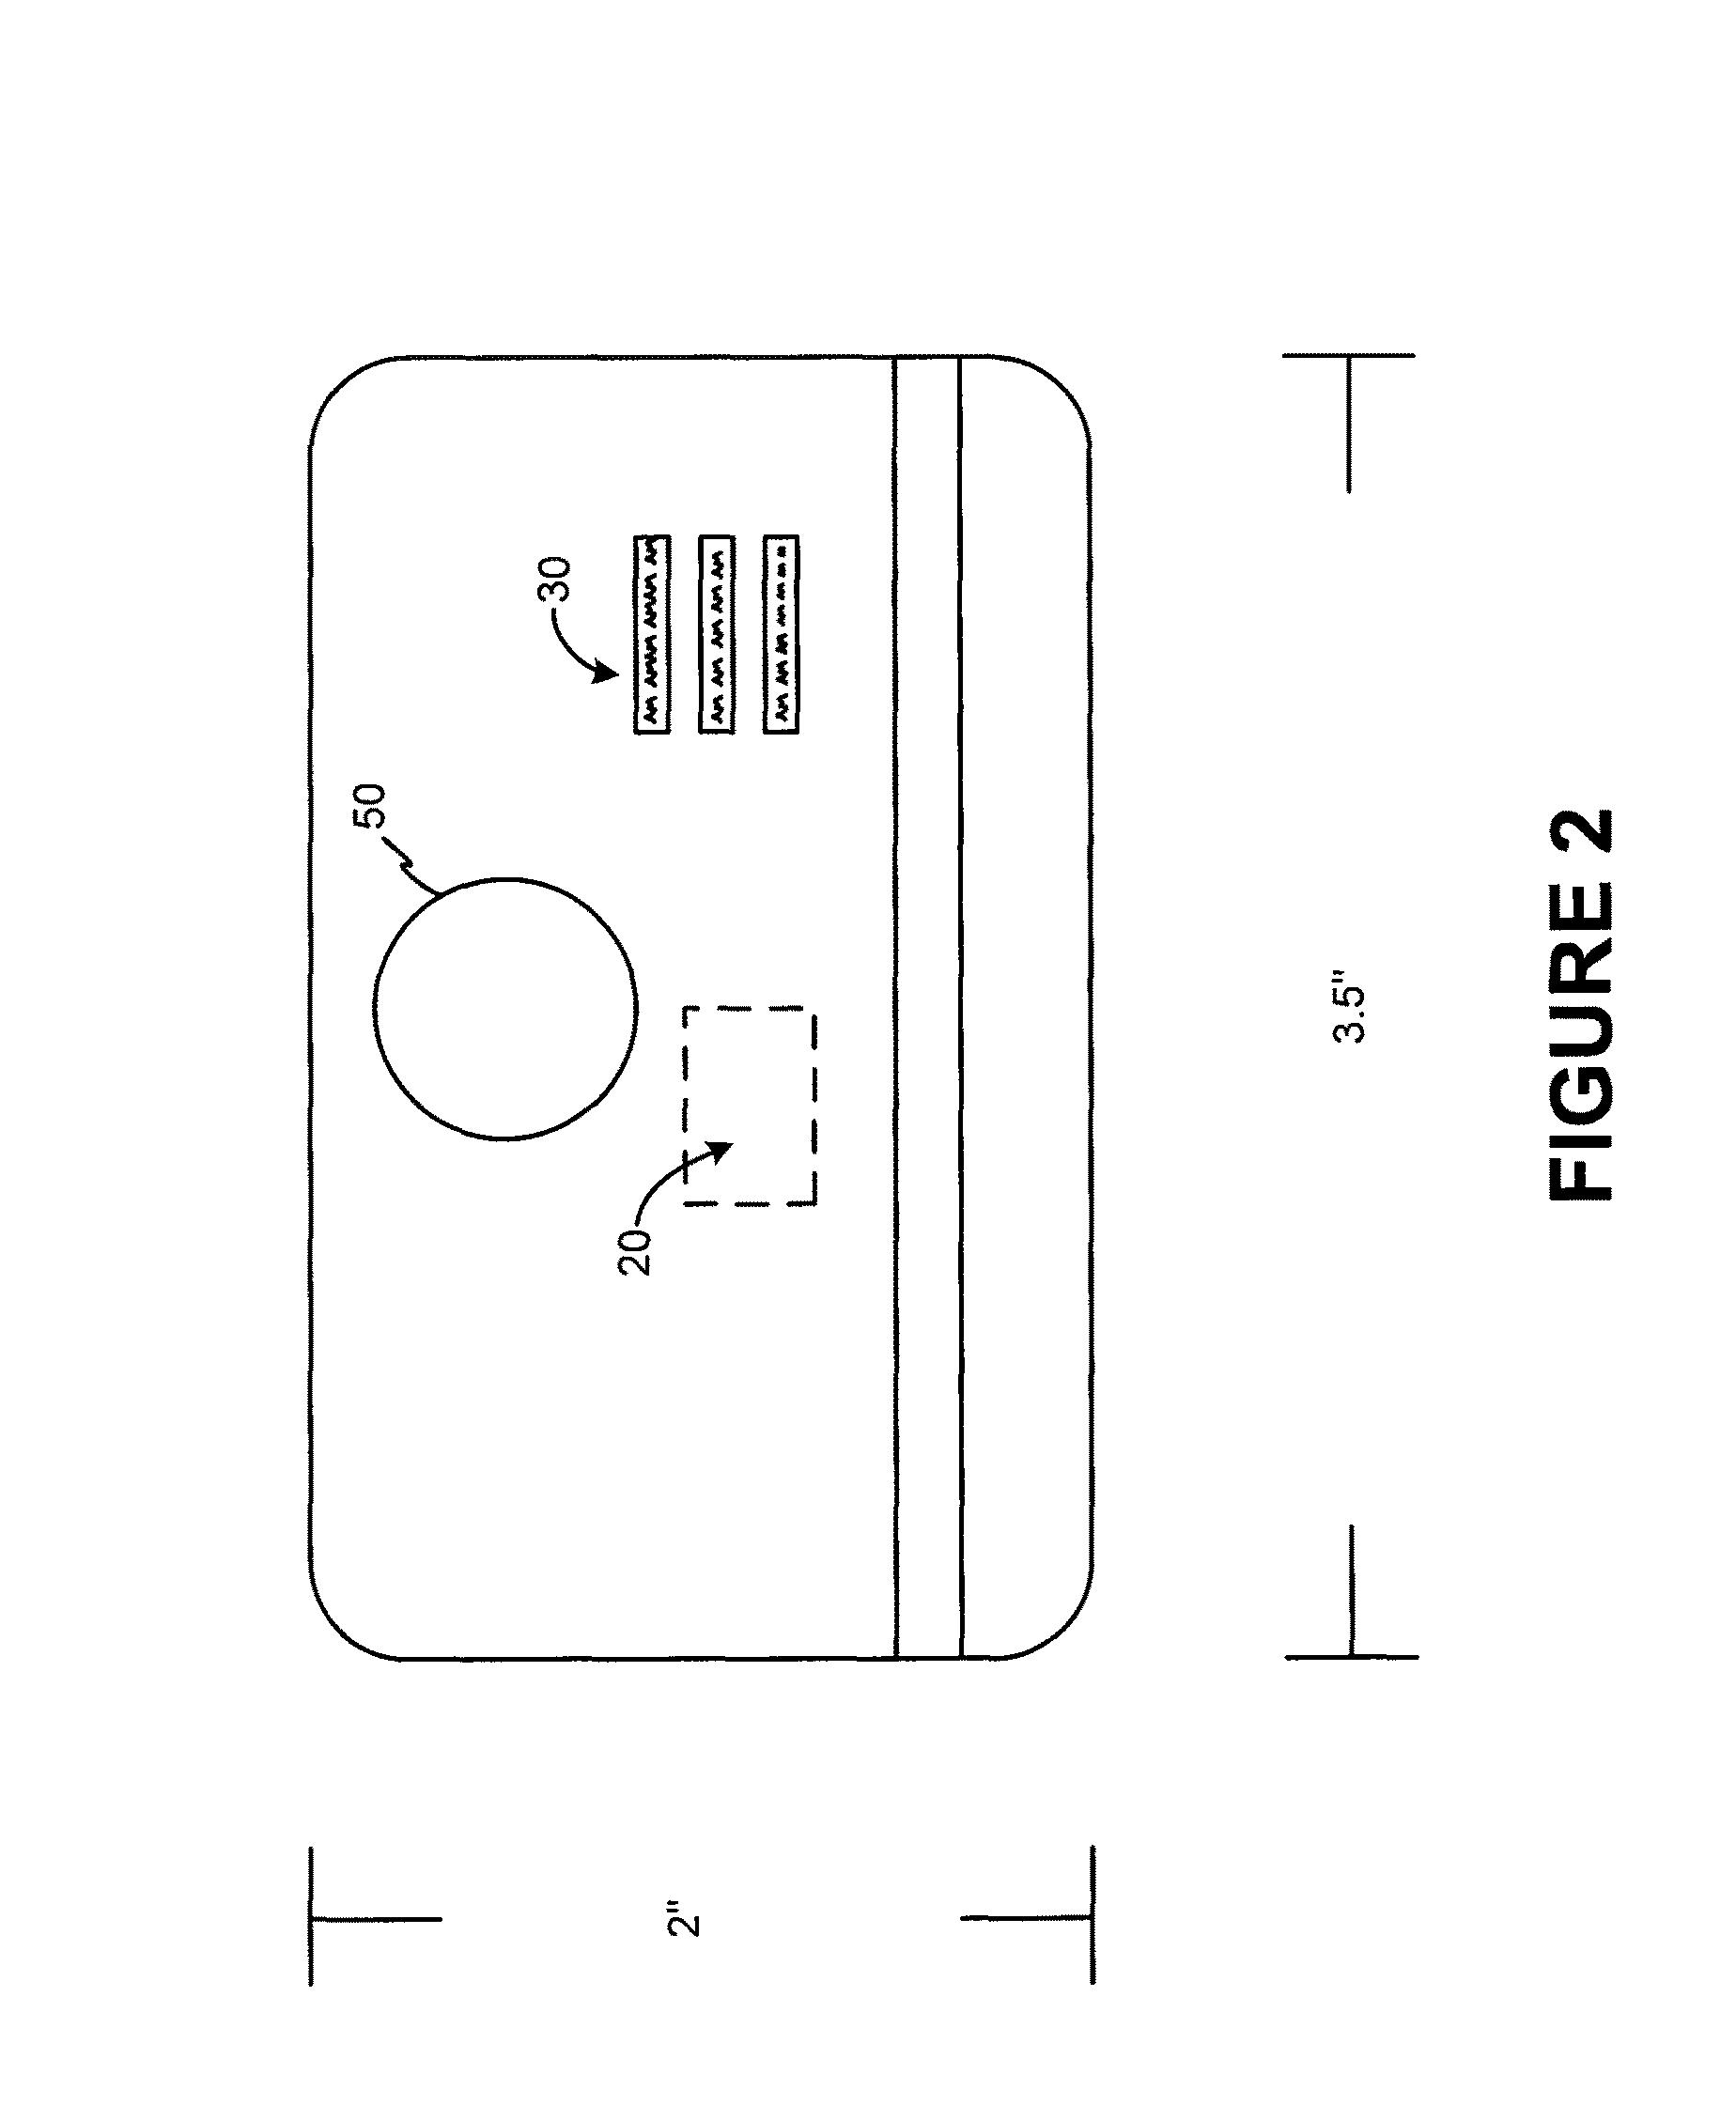 Patent Us 9881294 B2 Computerpowered Rs232 Circuit Diagram Tradeoficcom Images